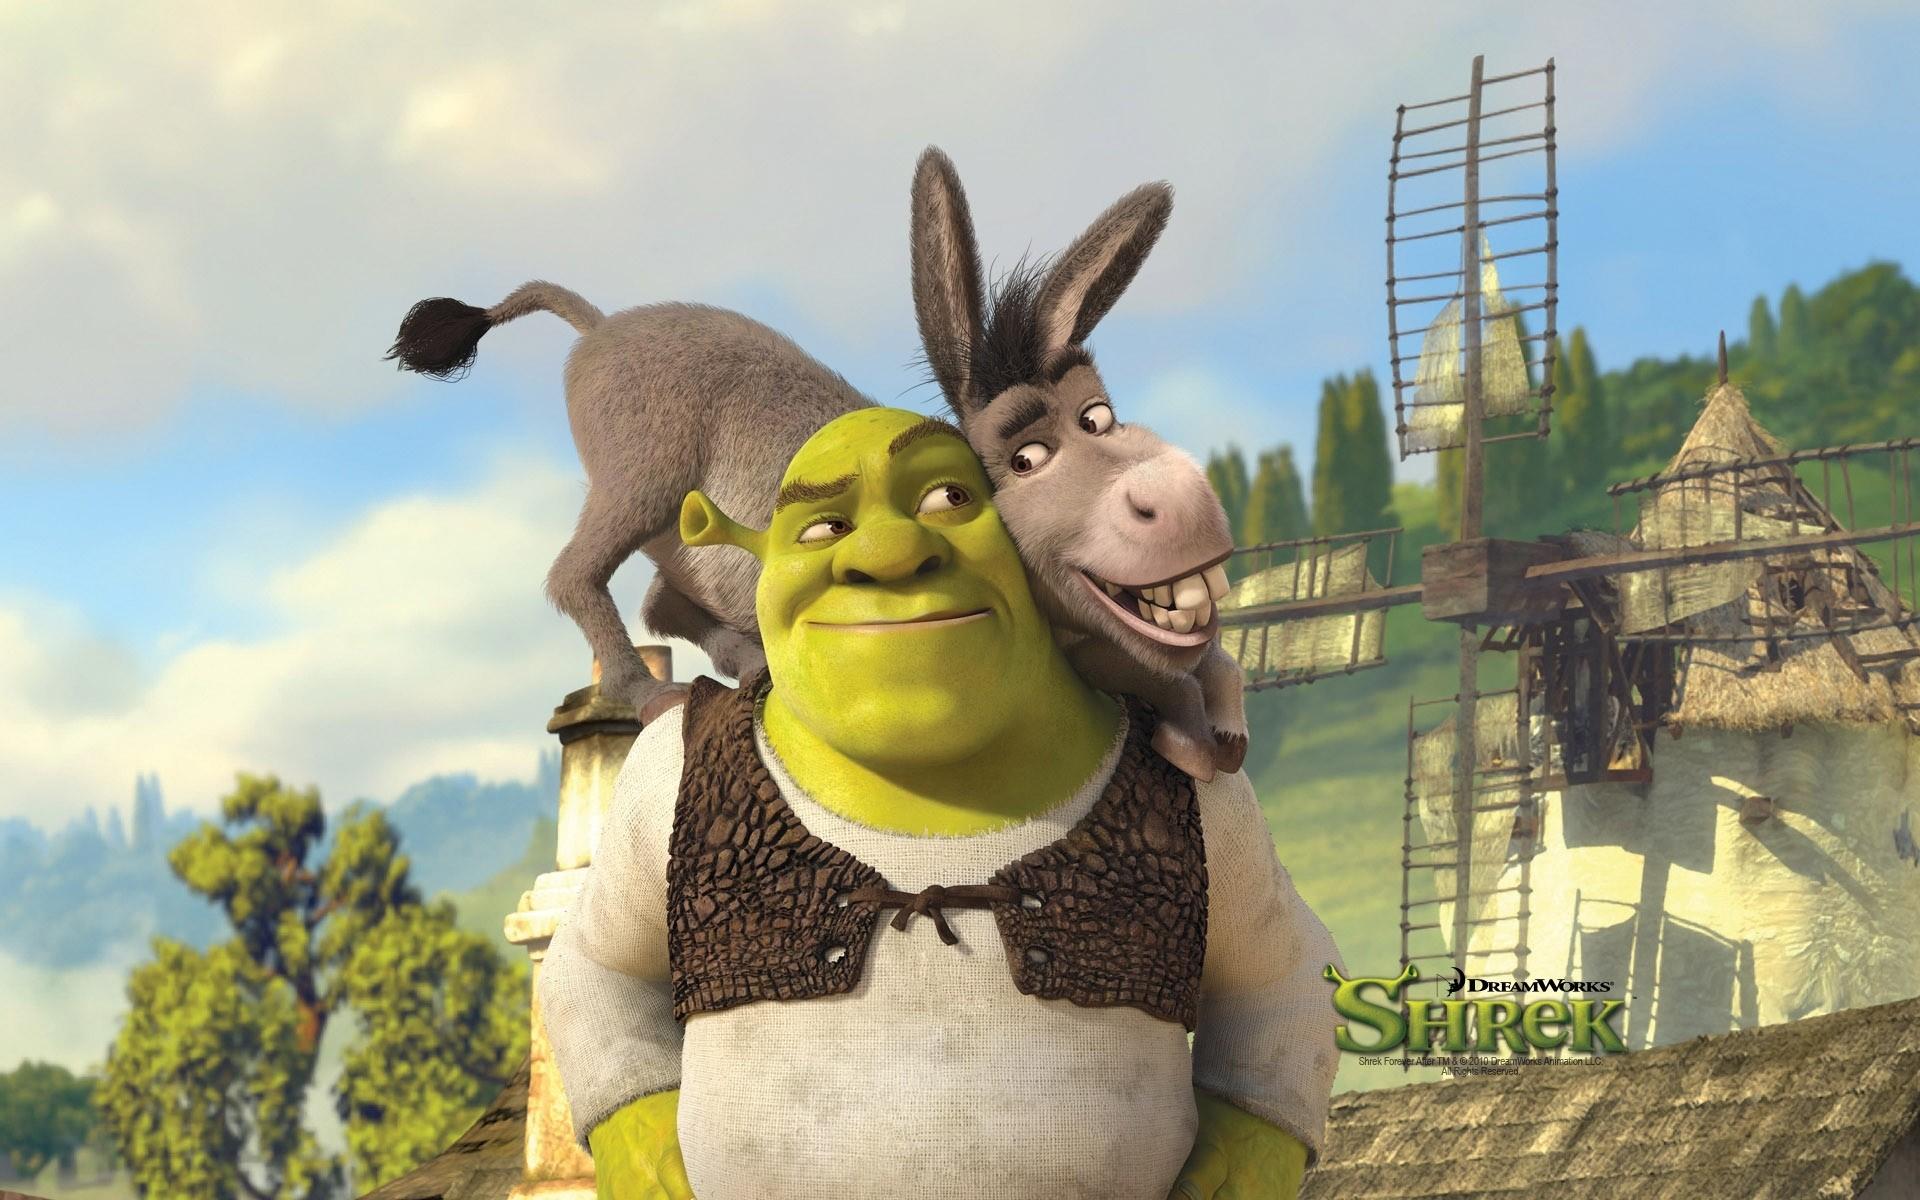 Shrek Images Wallpapers (51 Wallpapers)